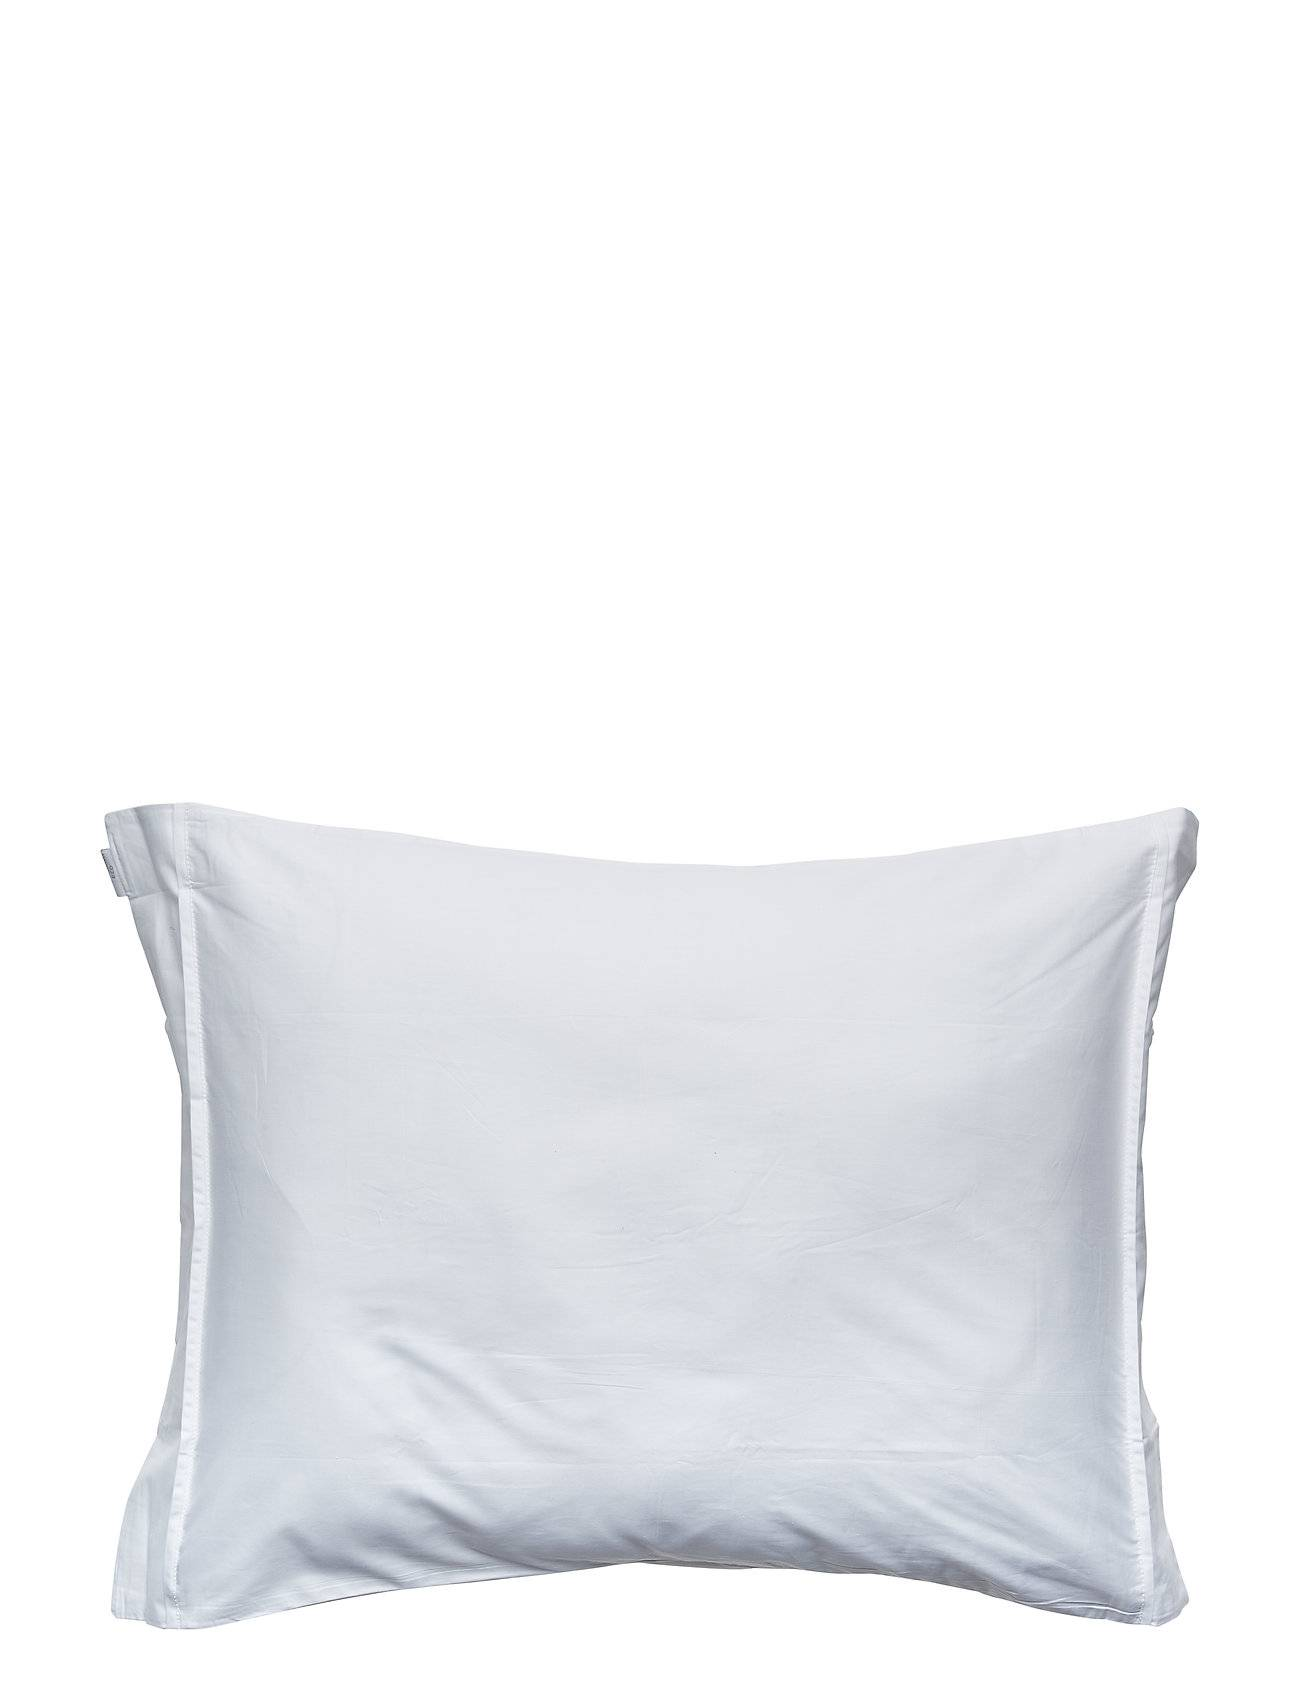 Gripsholm Pillowcase Eco Percale Selma